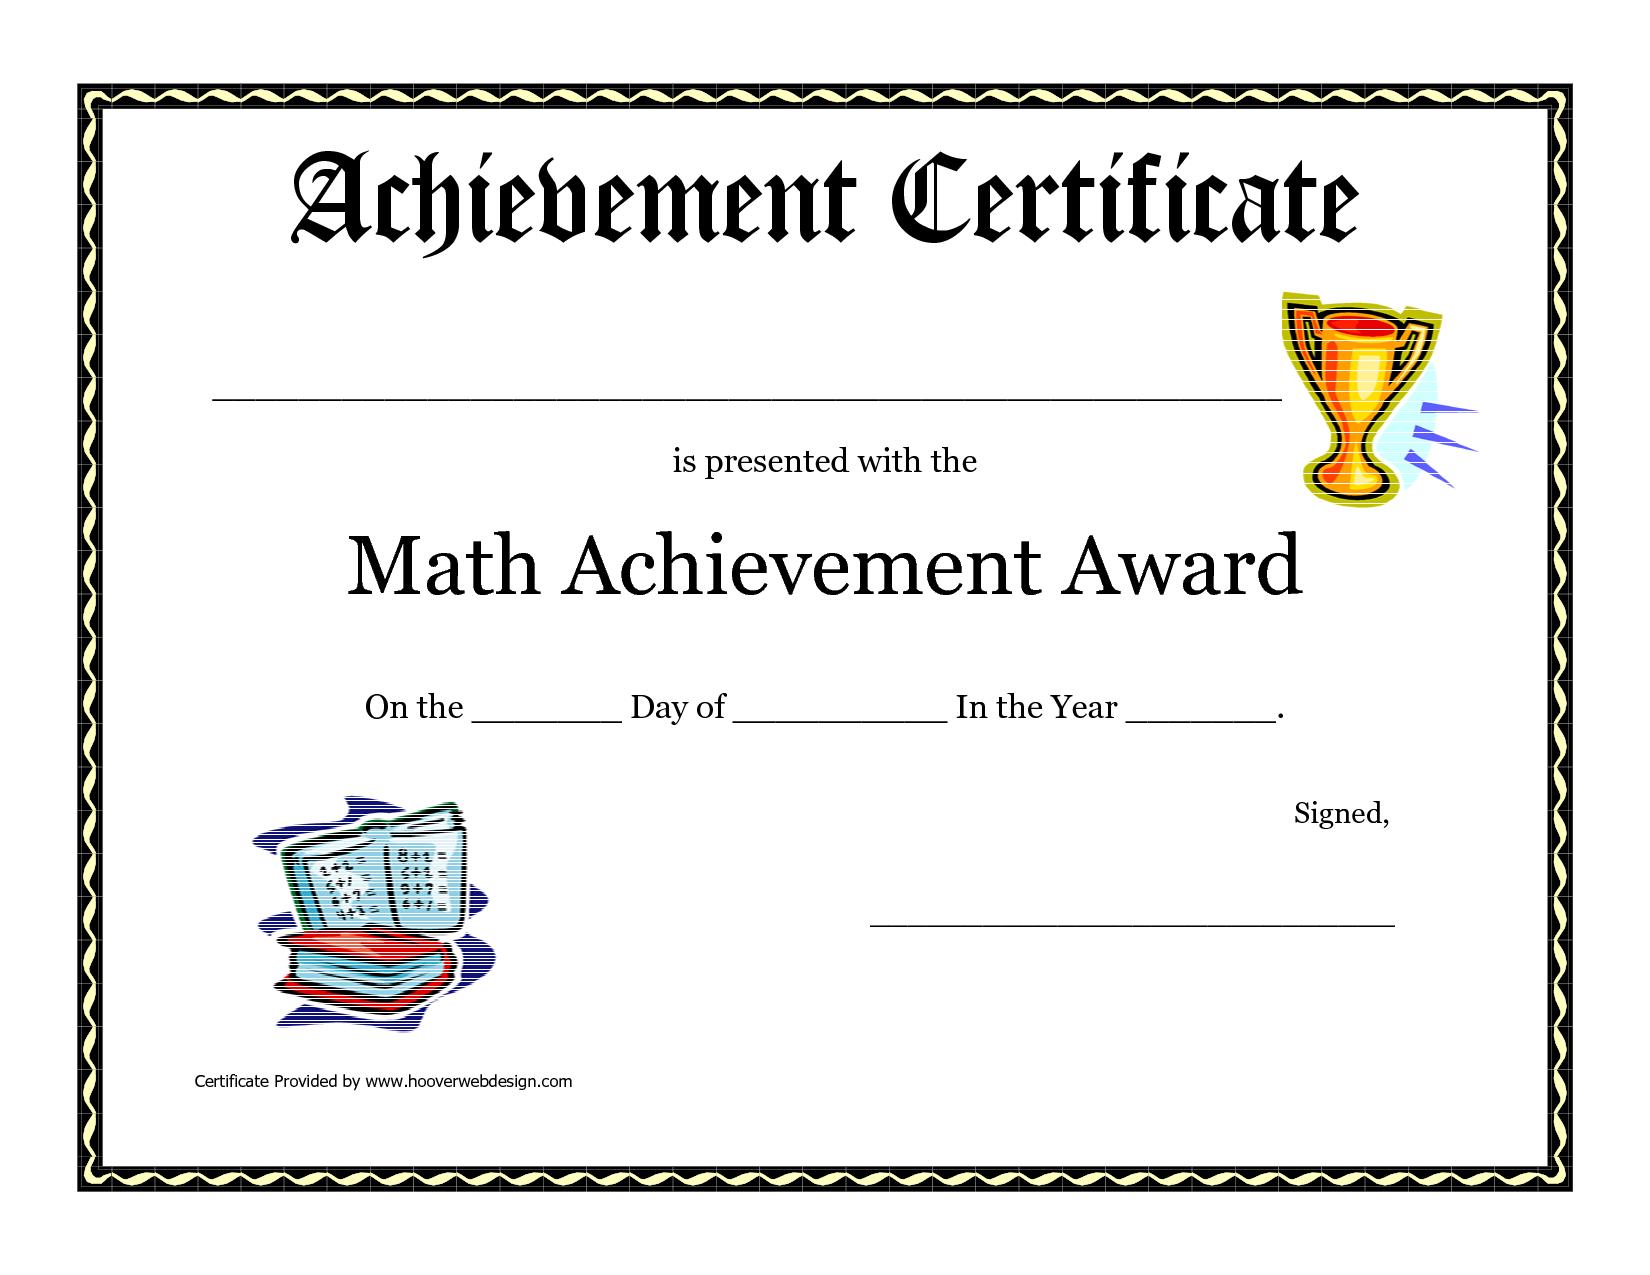 Math Achievement Award Printable Certificate Pdf | Math Activites - Free Printable Swimming Certificates For Kids